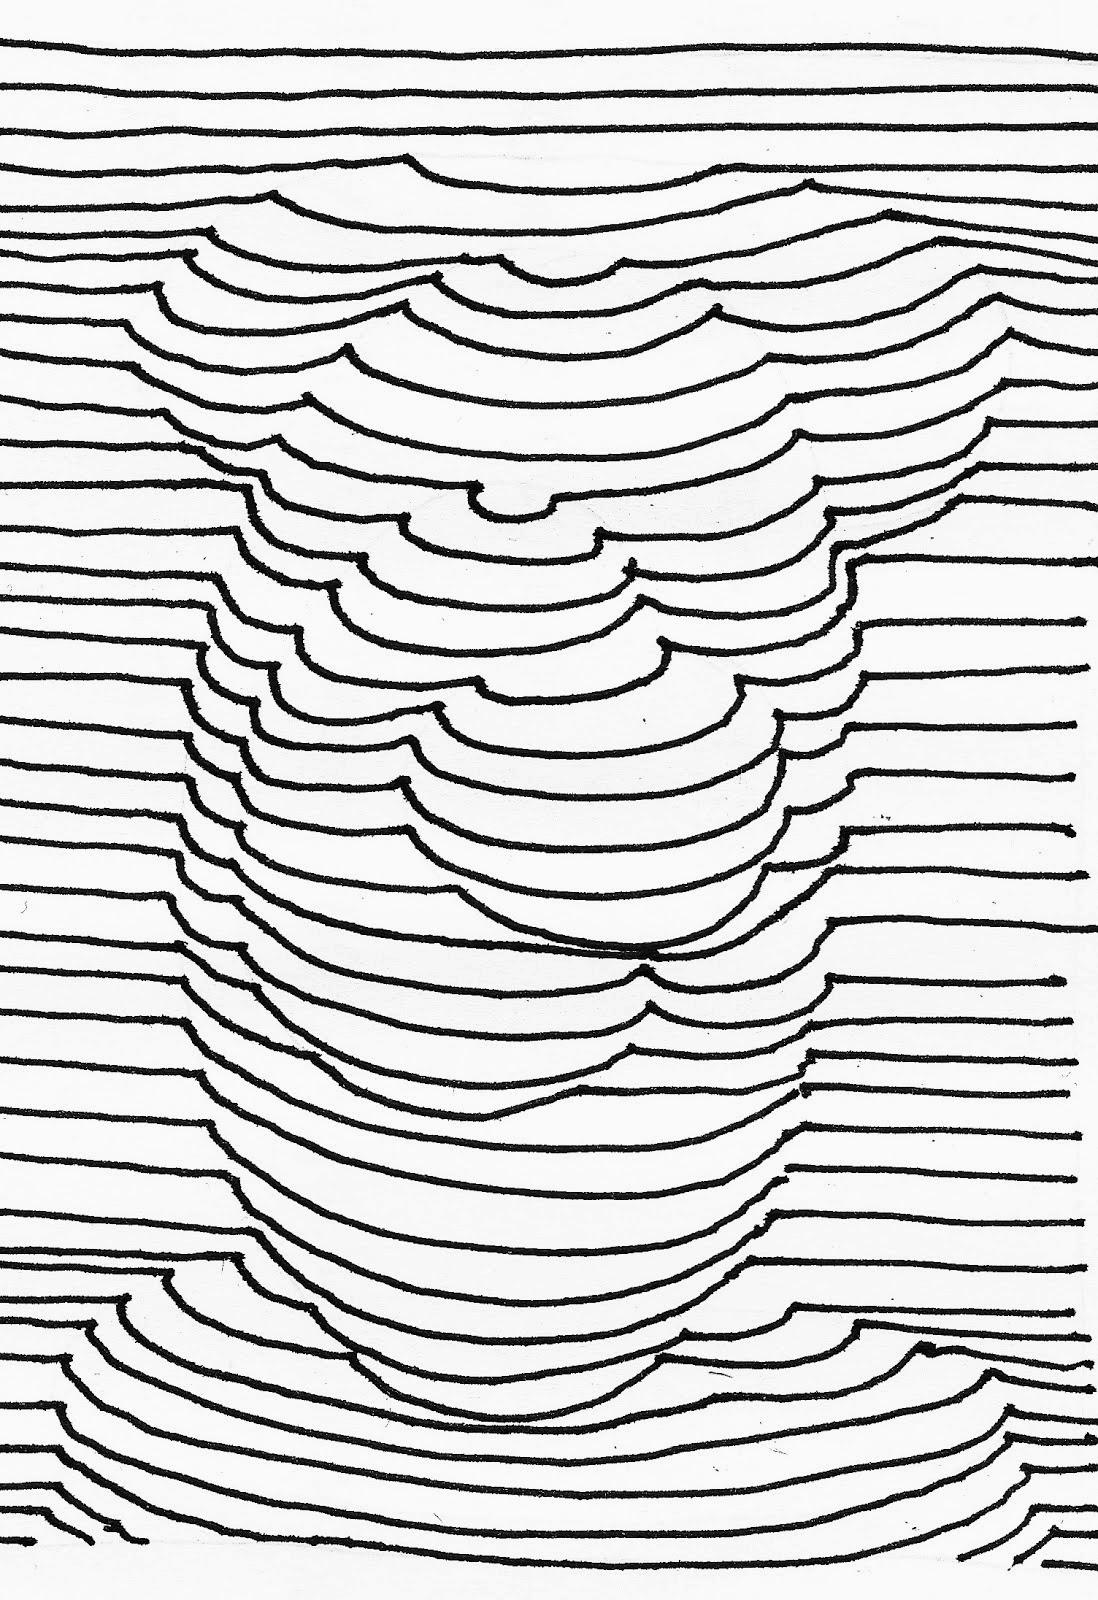 la percepci u00f3n visual  leyes y principios